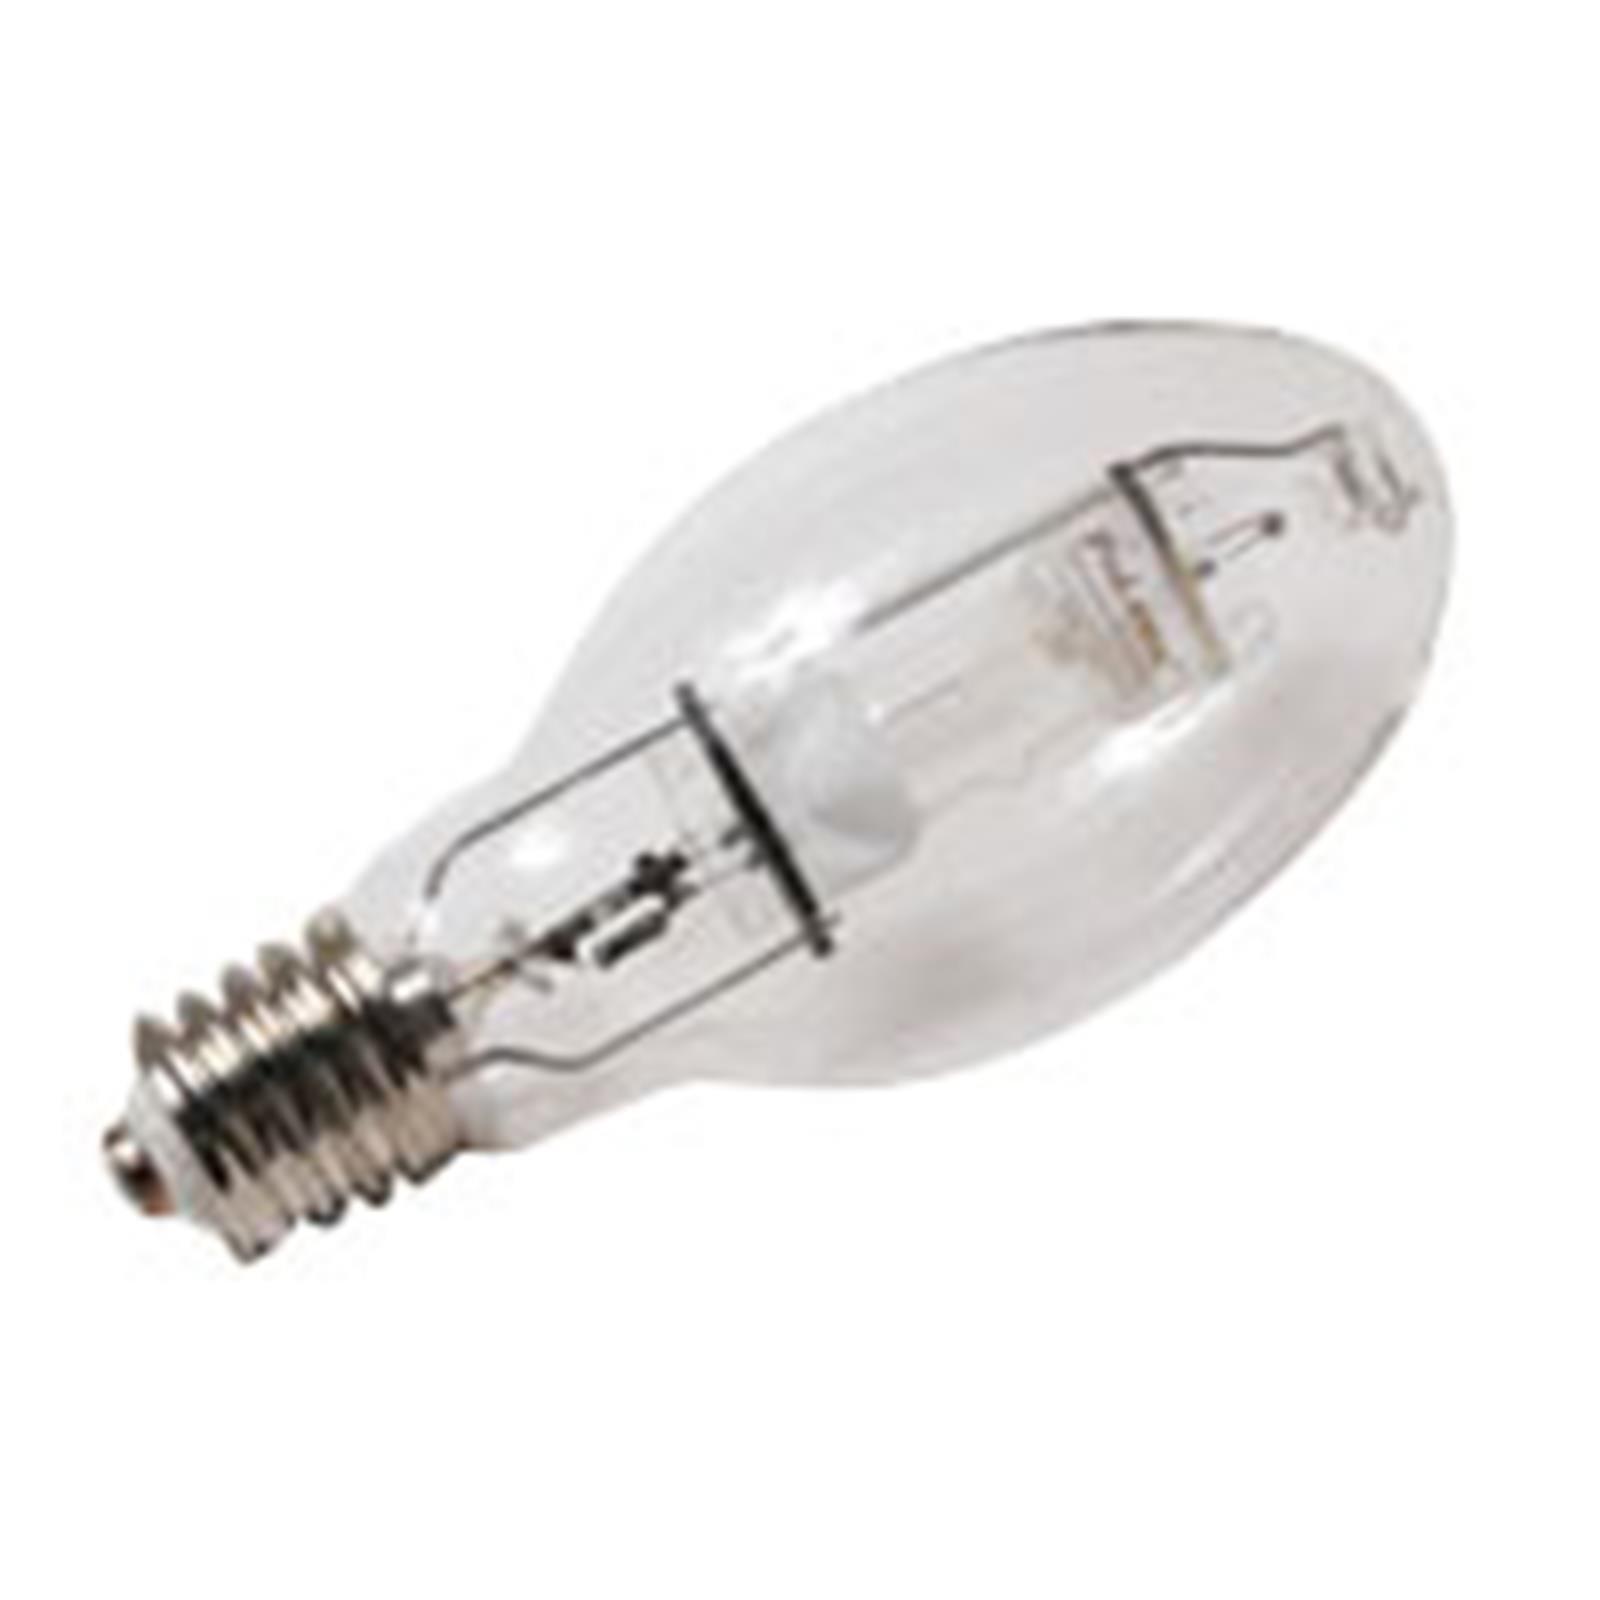 6 Qty. Halco 320W MH ED28 MOG BU PS ProLumeUN2911 M154/E; M132/E MH320/BU/PS 320w HID Pulse Start Clear Base Up Lamp Bulb